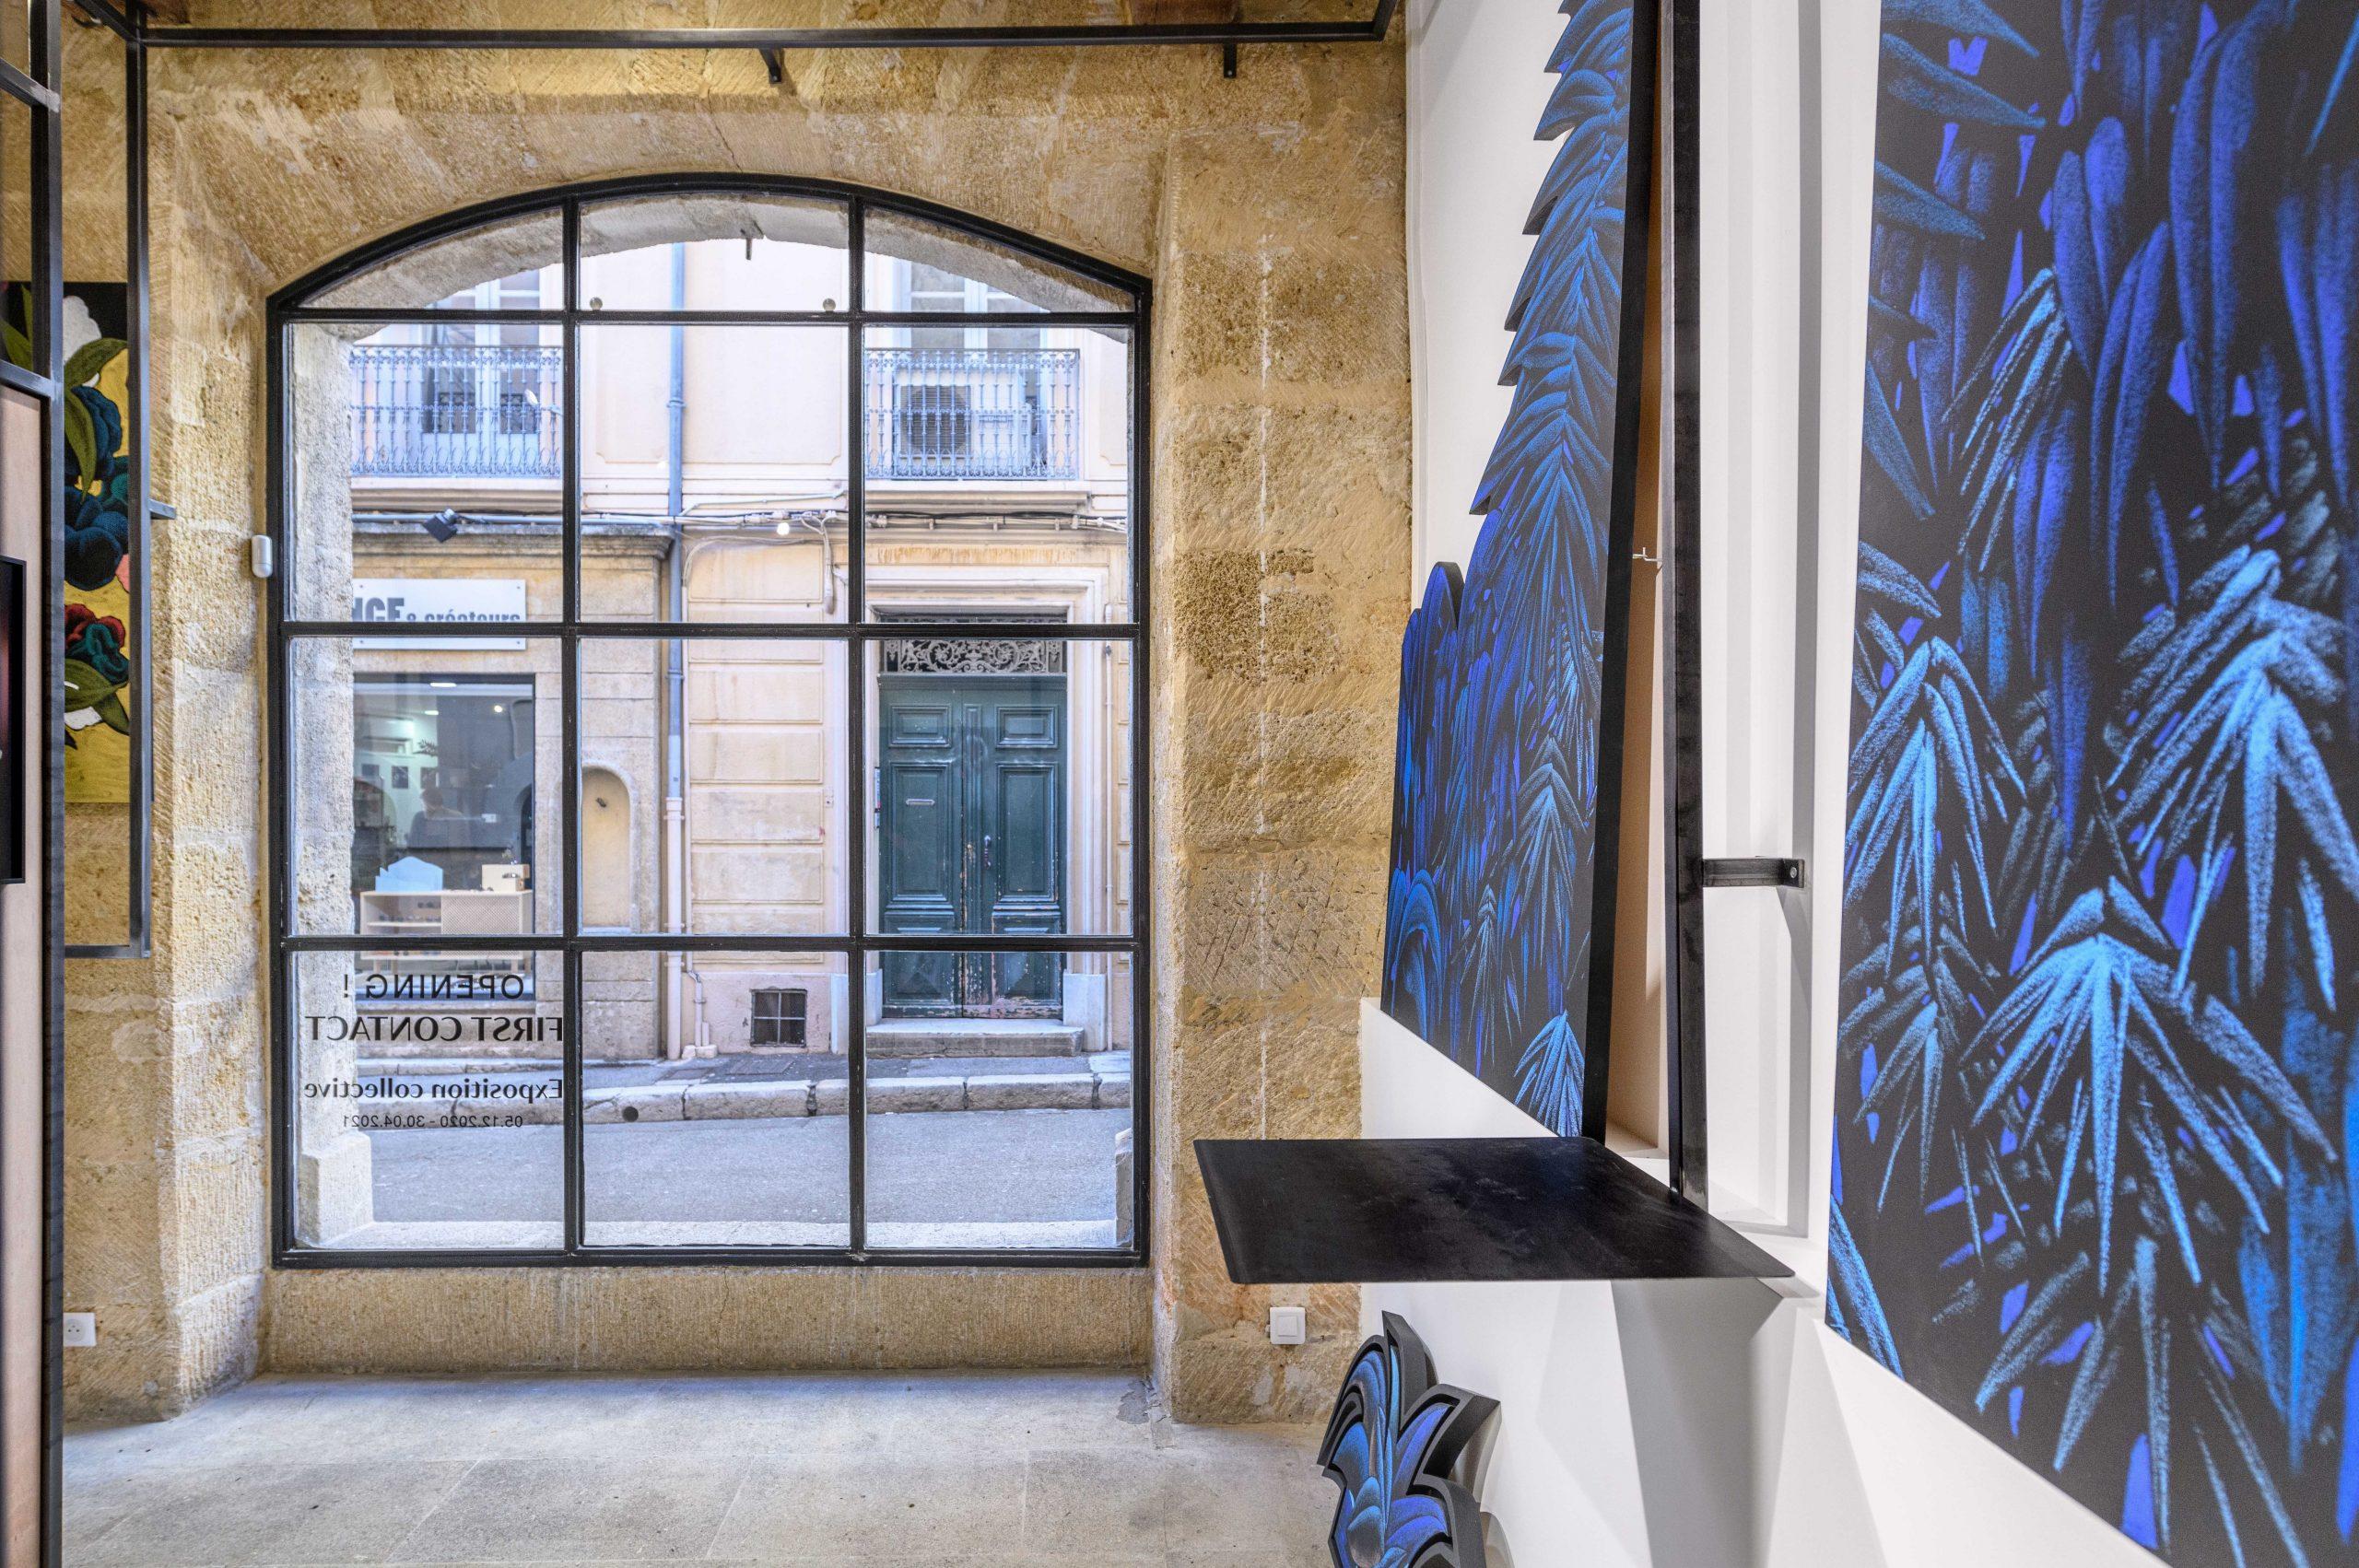 Studio Miha Galerie Ars Longa